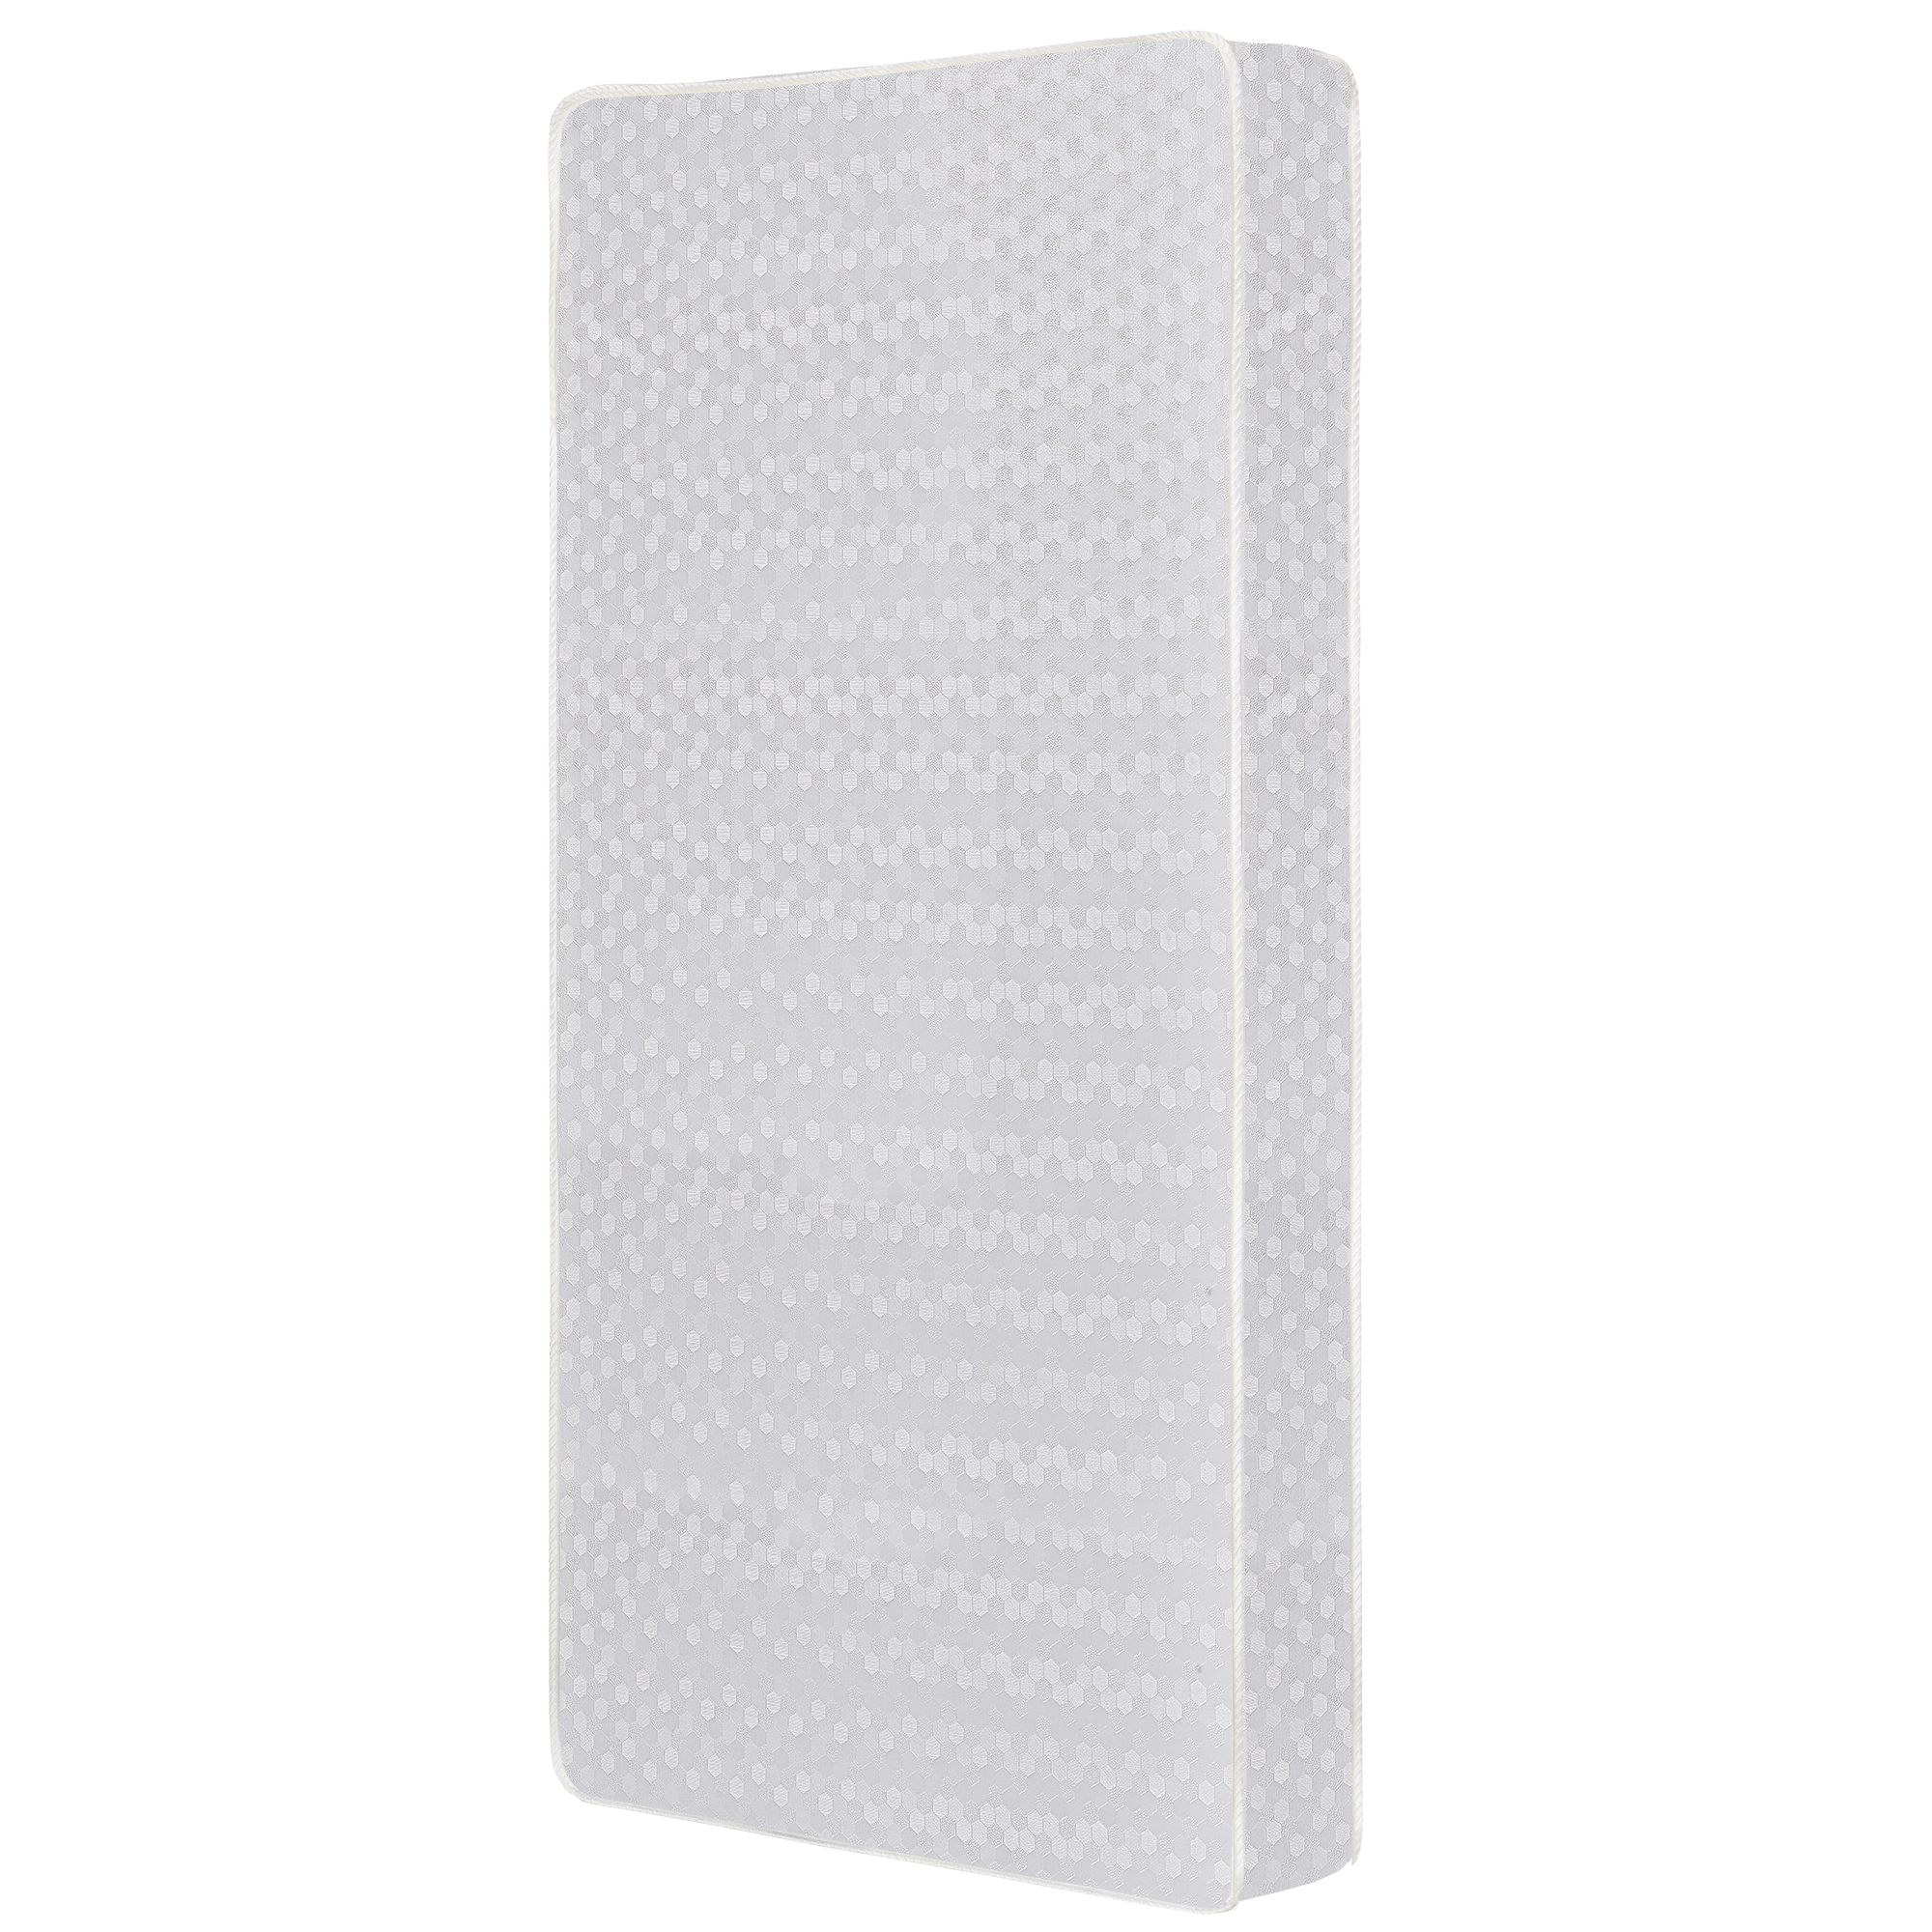 Dream On Me Orthopedic Standard Crib Mattress, Extra Firm Foam